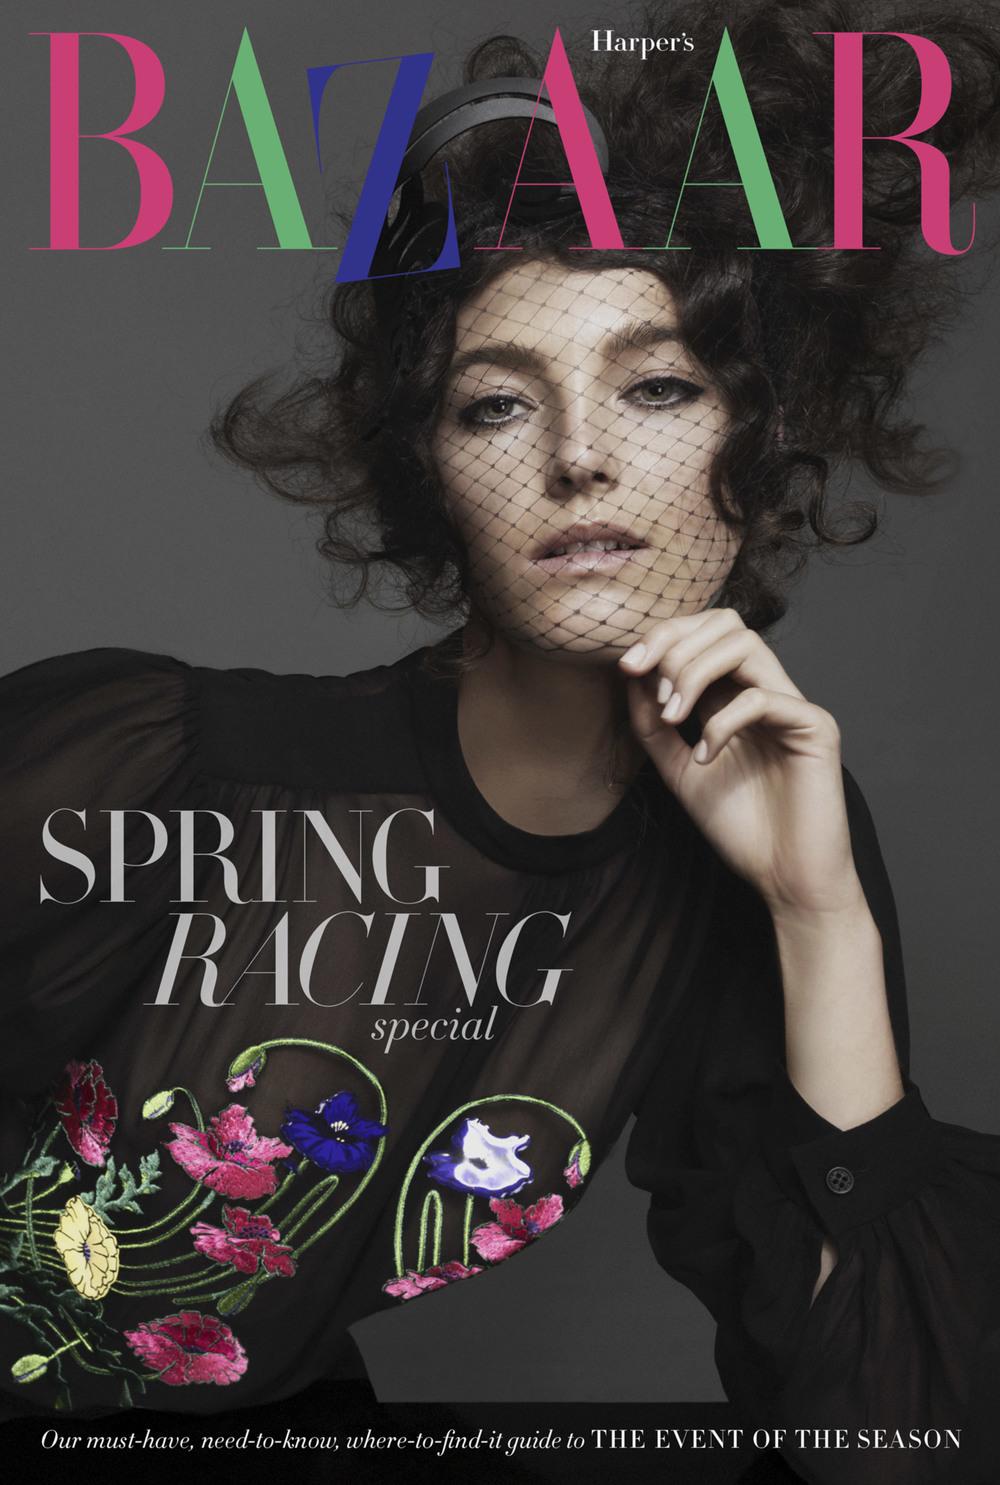 Spring-Racing-Cover.jpg